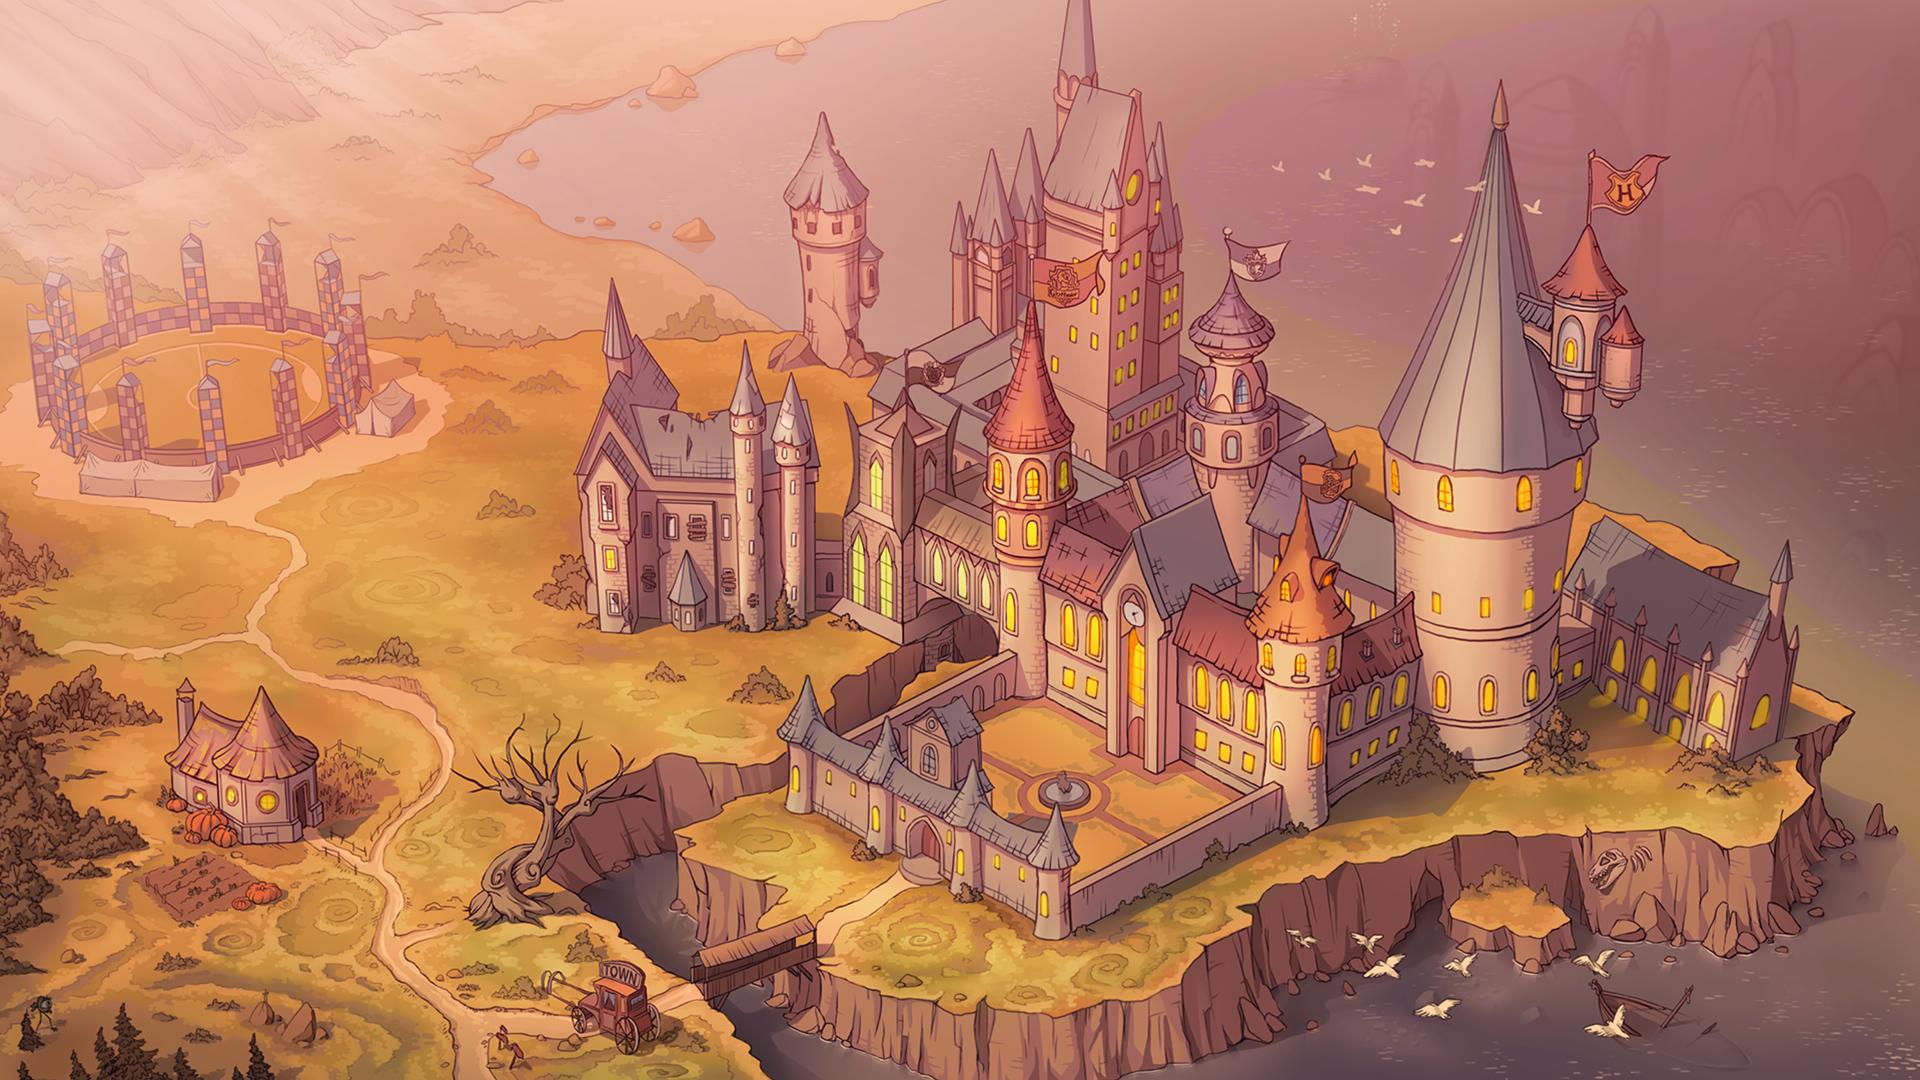 Wallpaper Harry Potter Hogwarts Castle 1920x1080 Kingwilfred